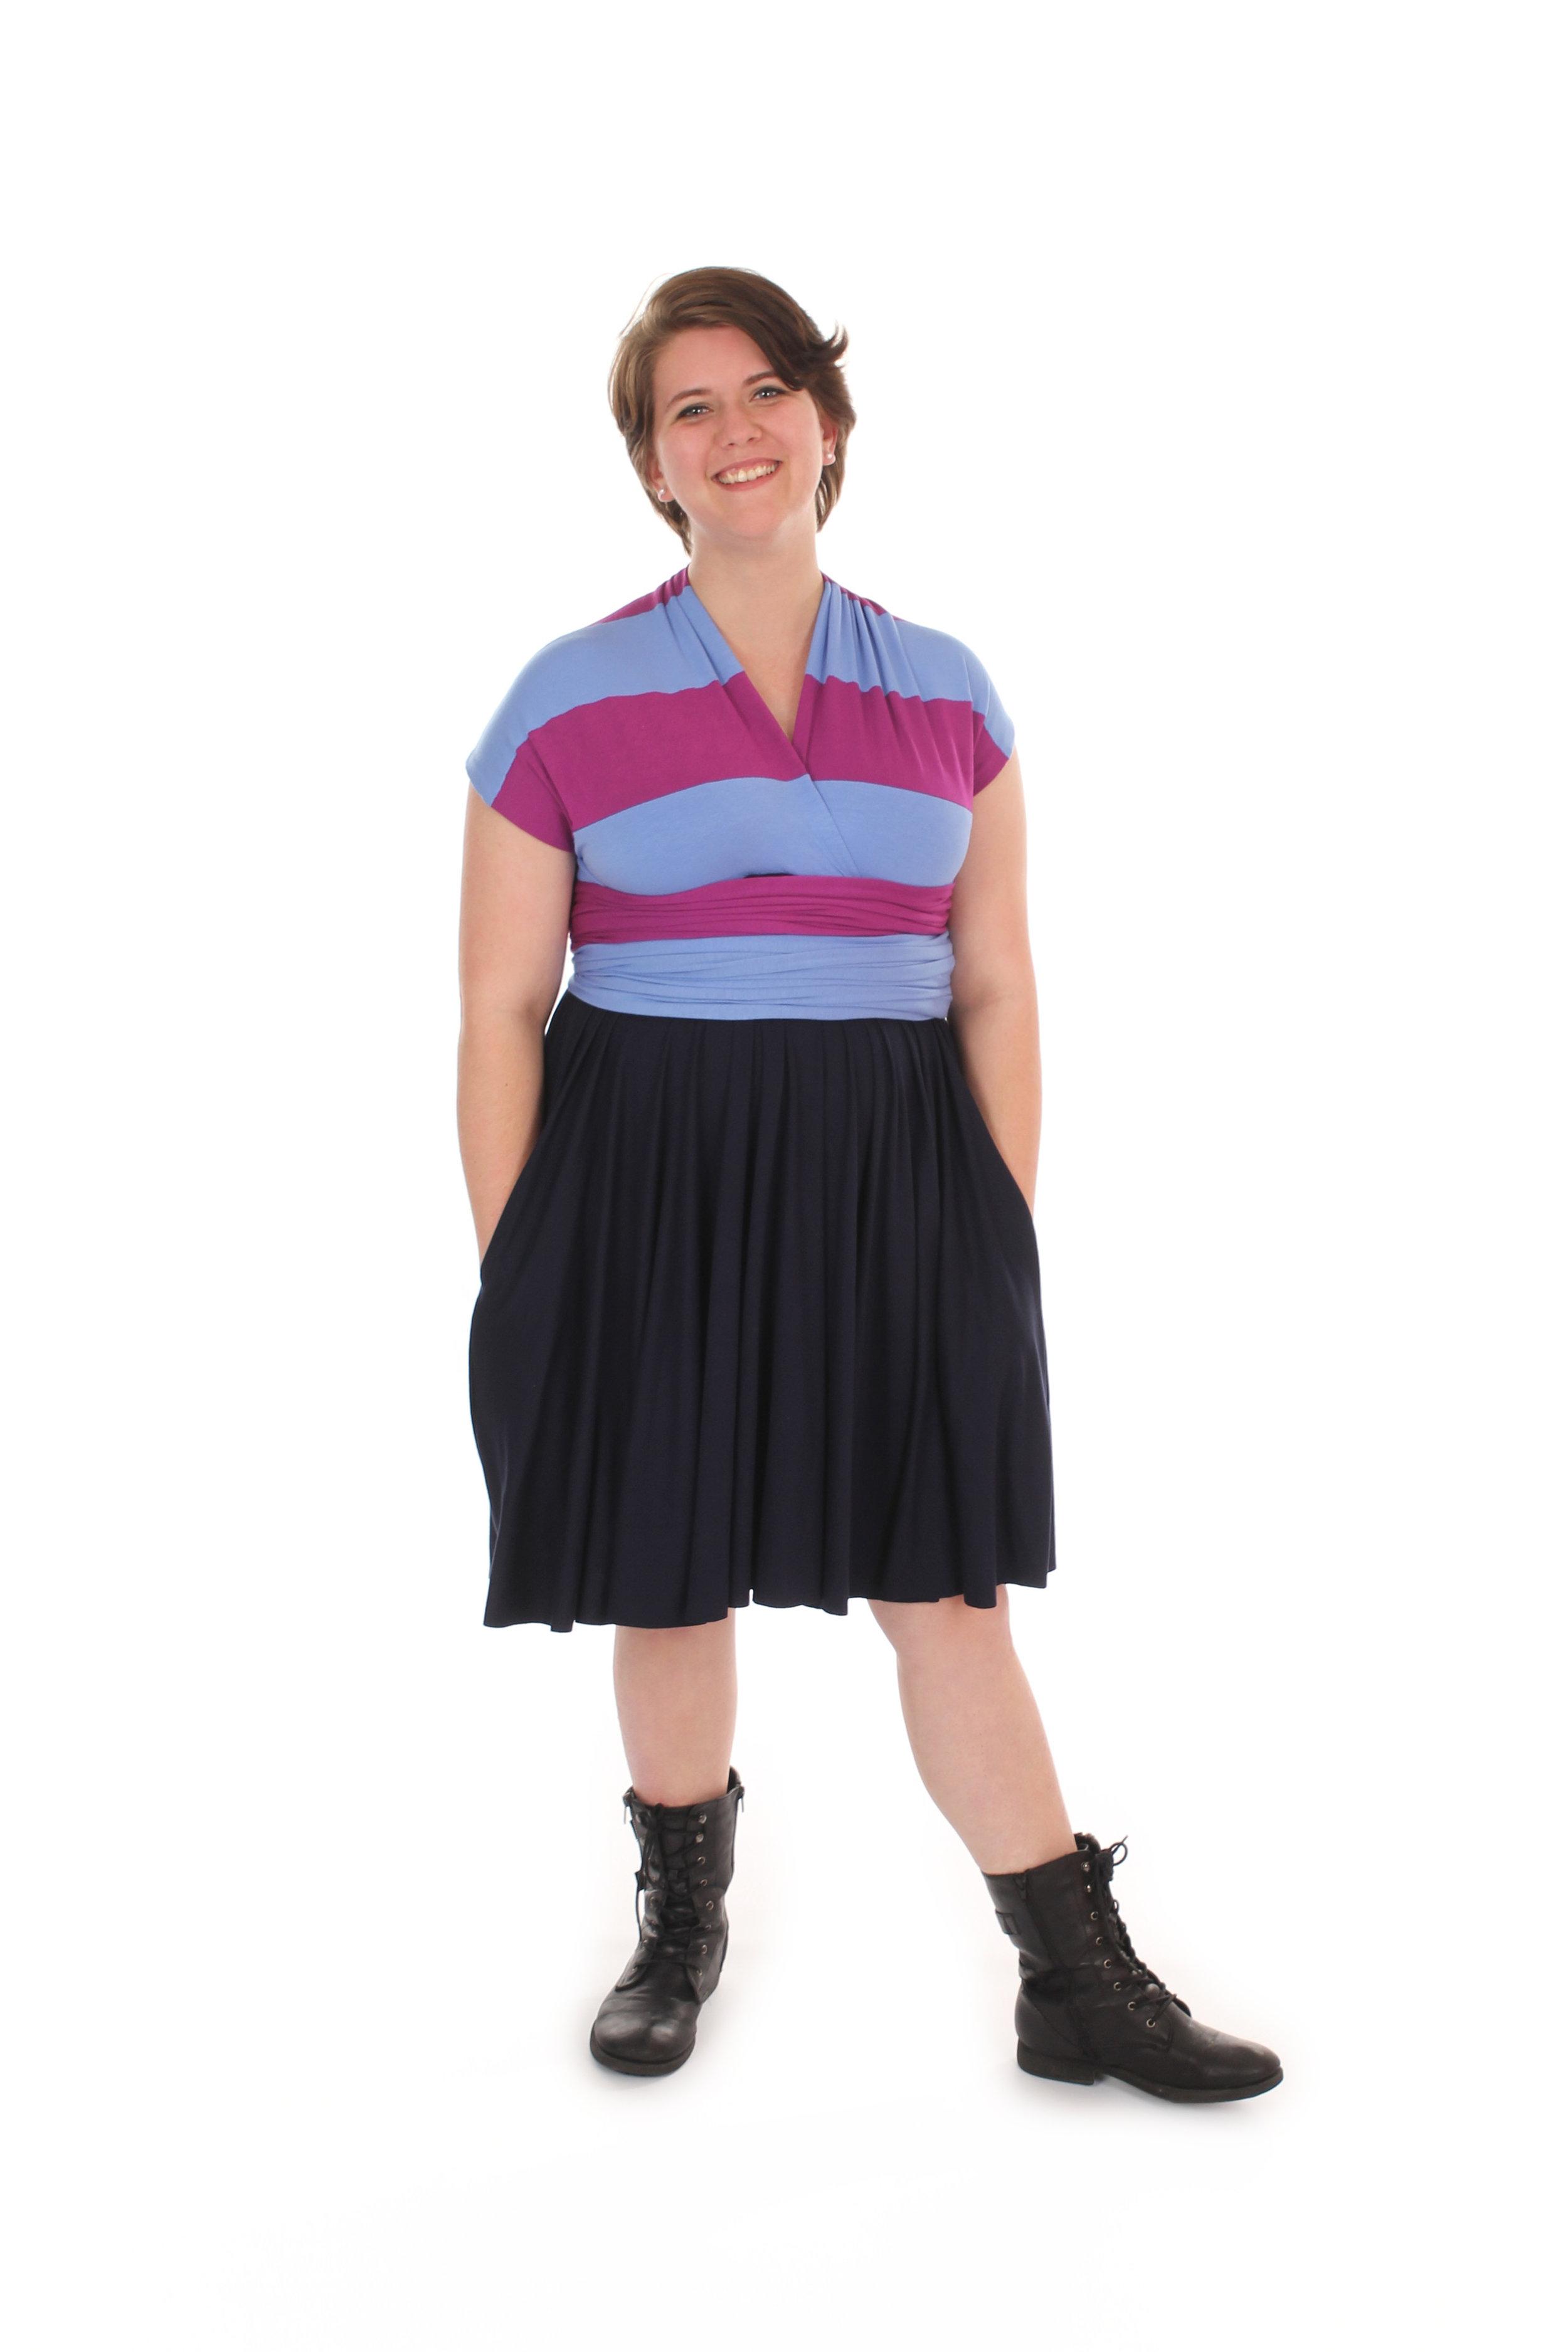 Frisk Inspired Convertible Dress